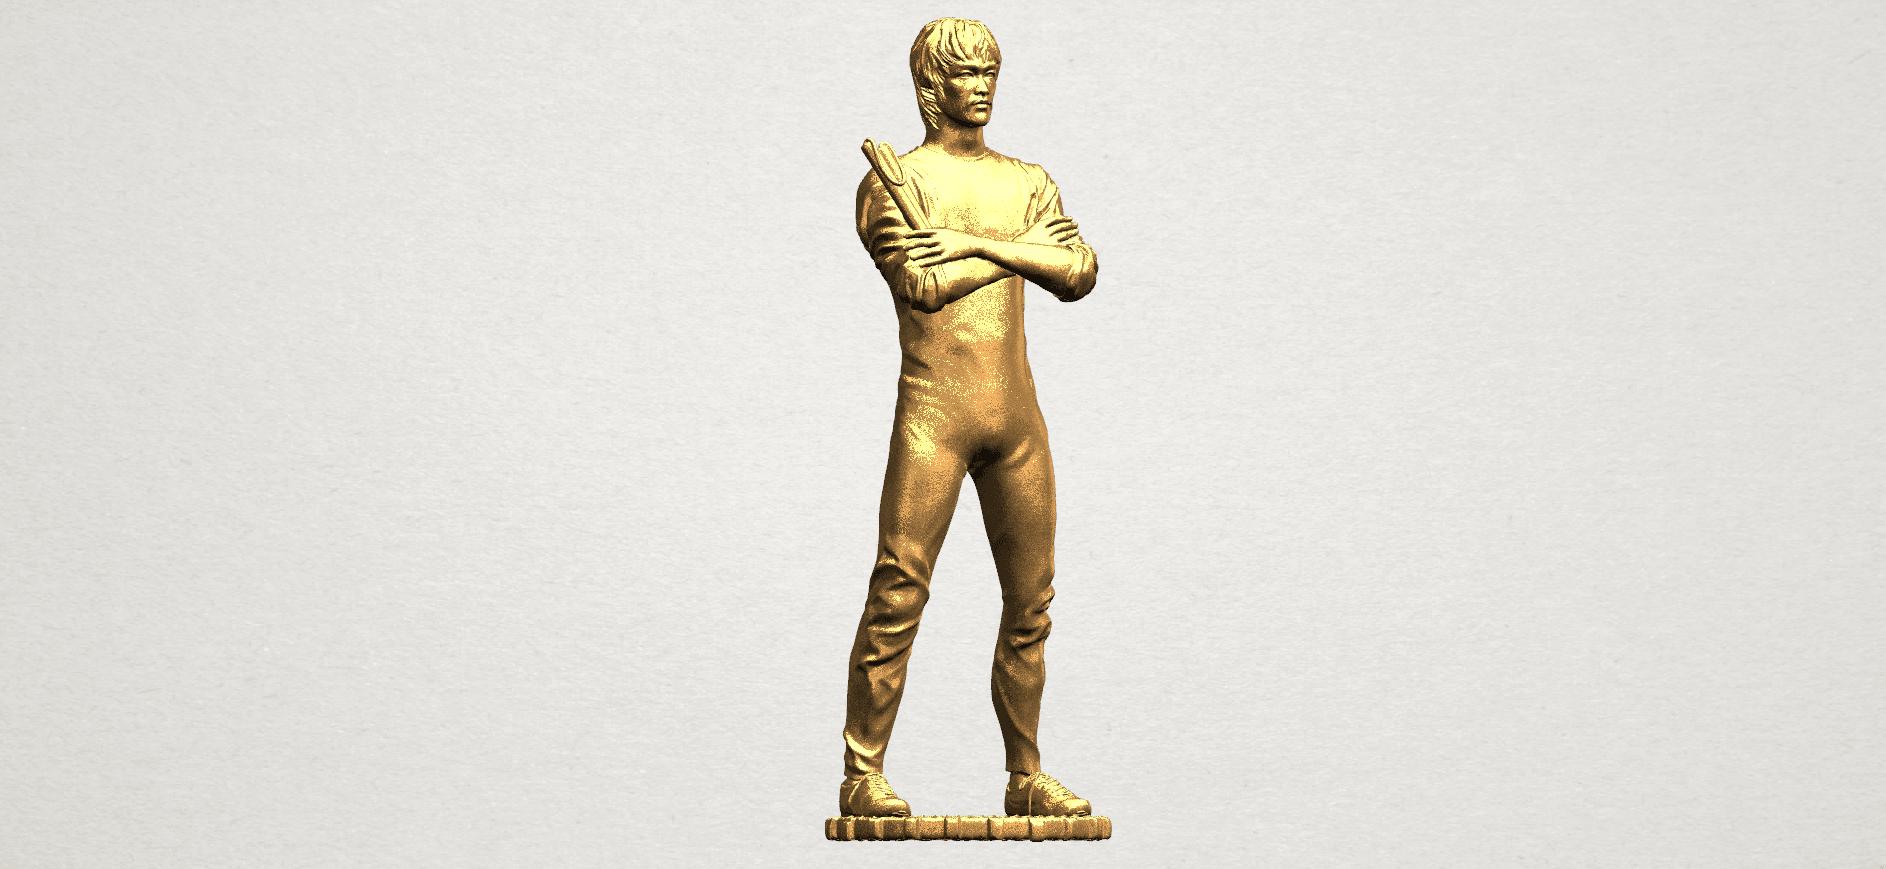 Bruce Lee A08.png Download free STL file Bruce Lee • 3D printing design, GeorgesNikkei